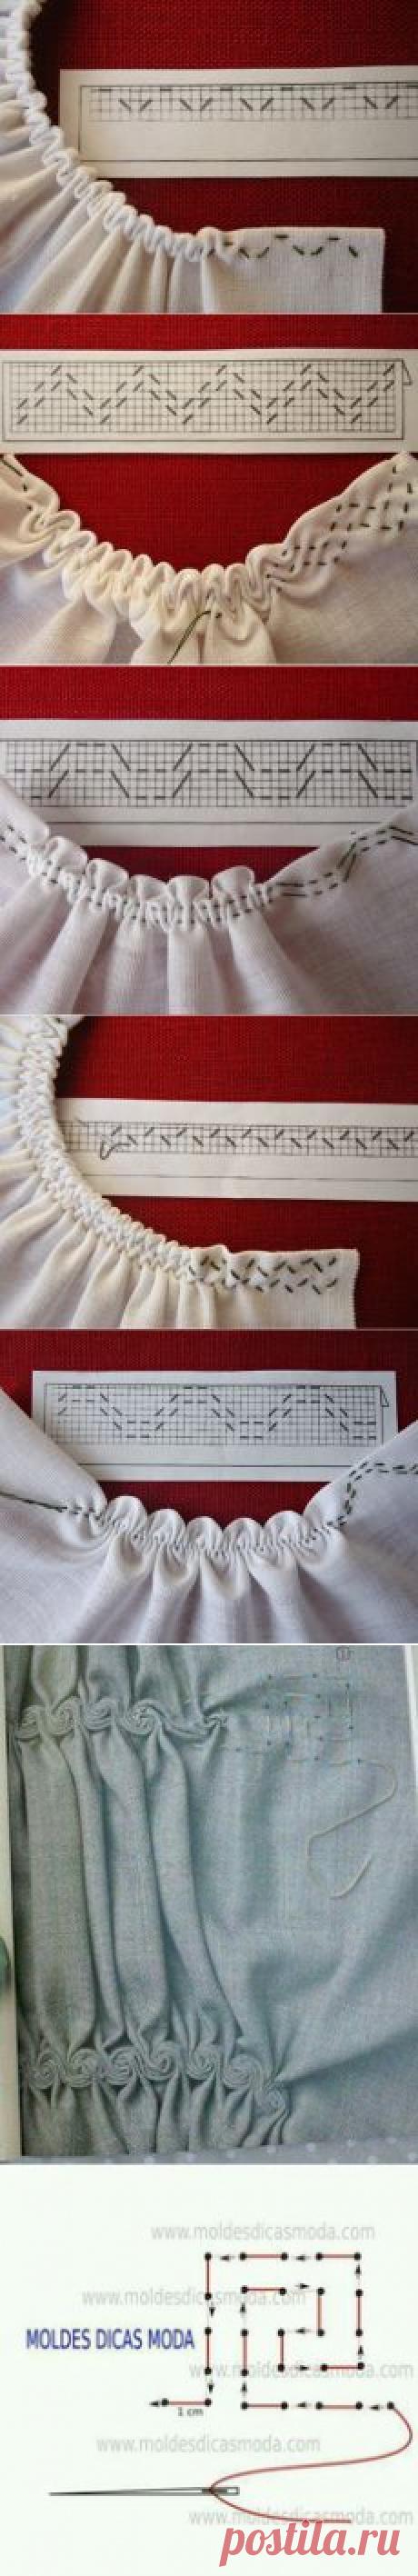 (290) Идеи для шитья